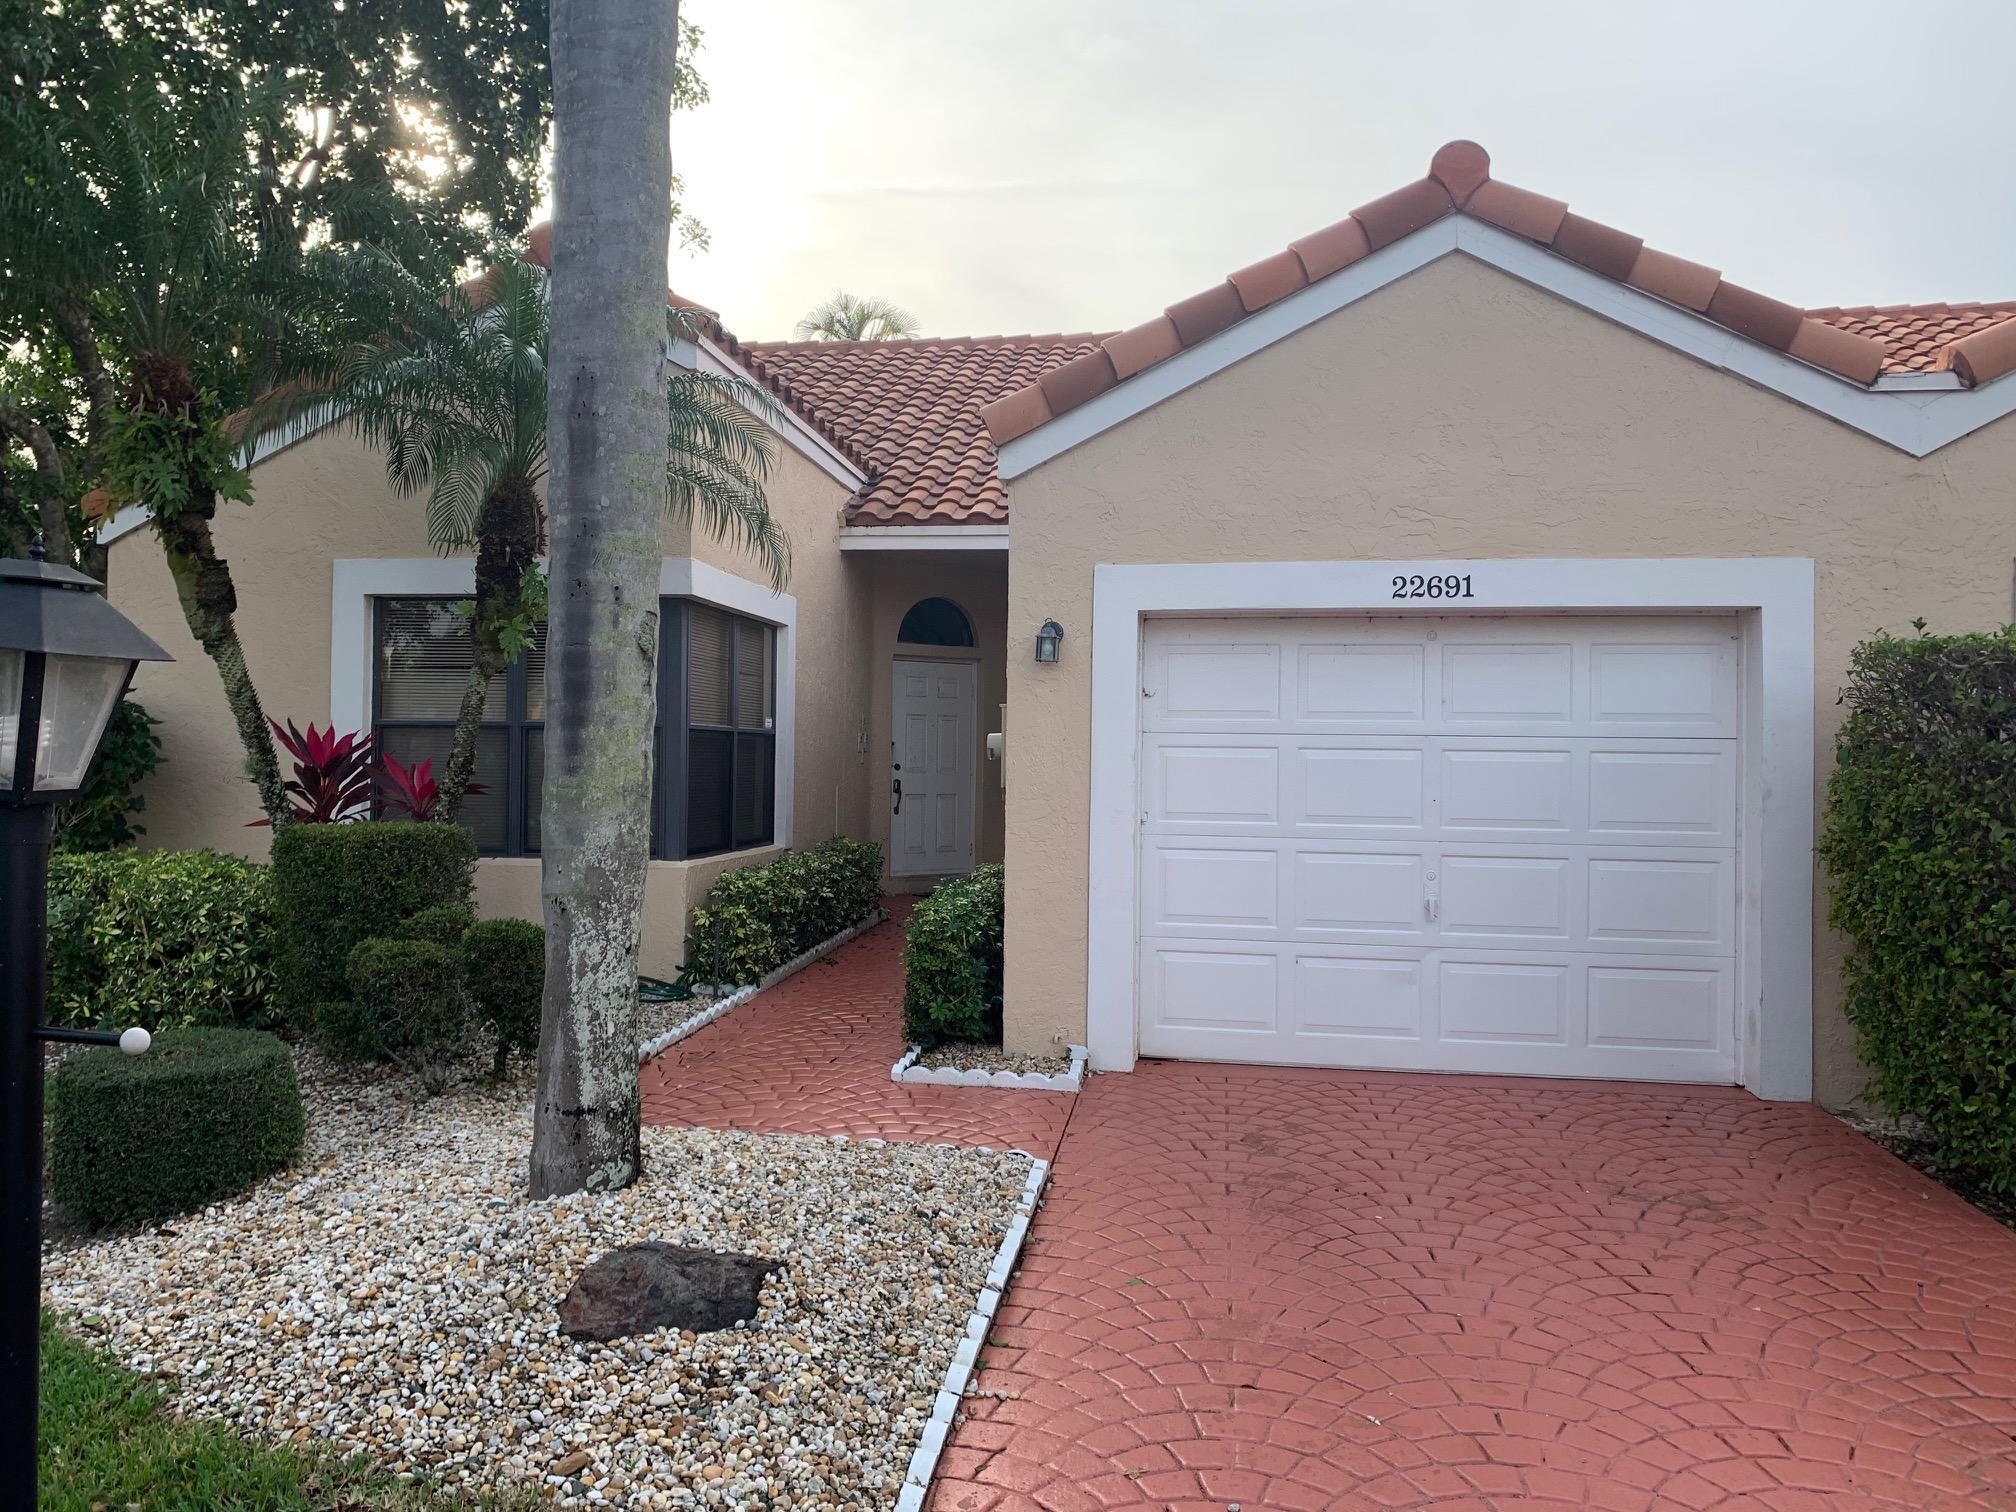 22691 Meridiana Drive Boca Raton, FL 33433